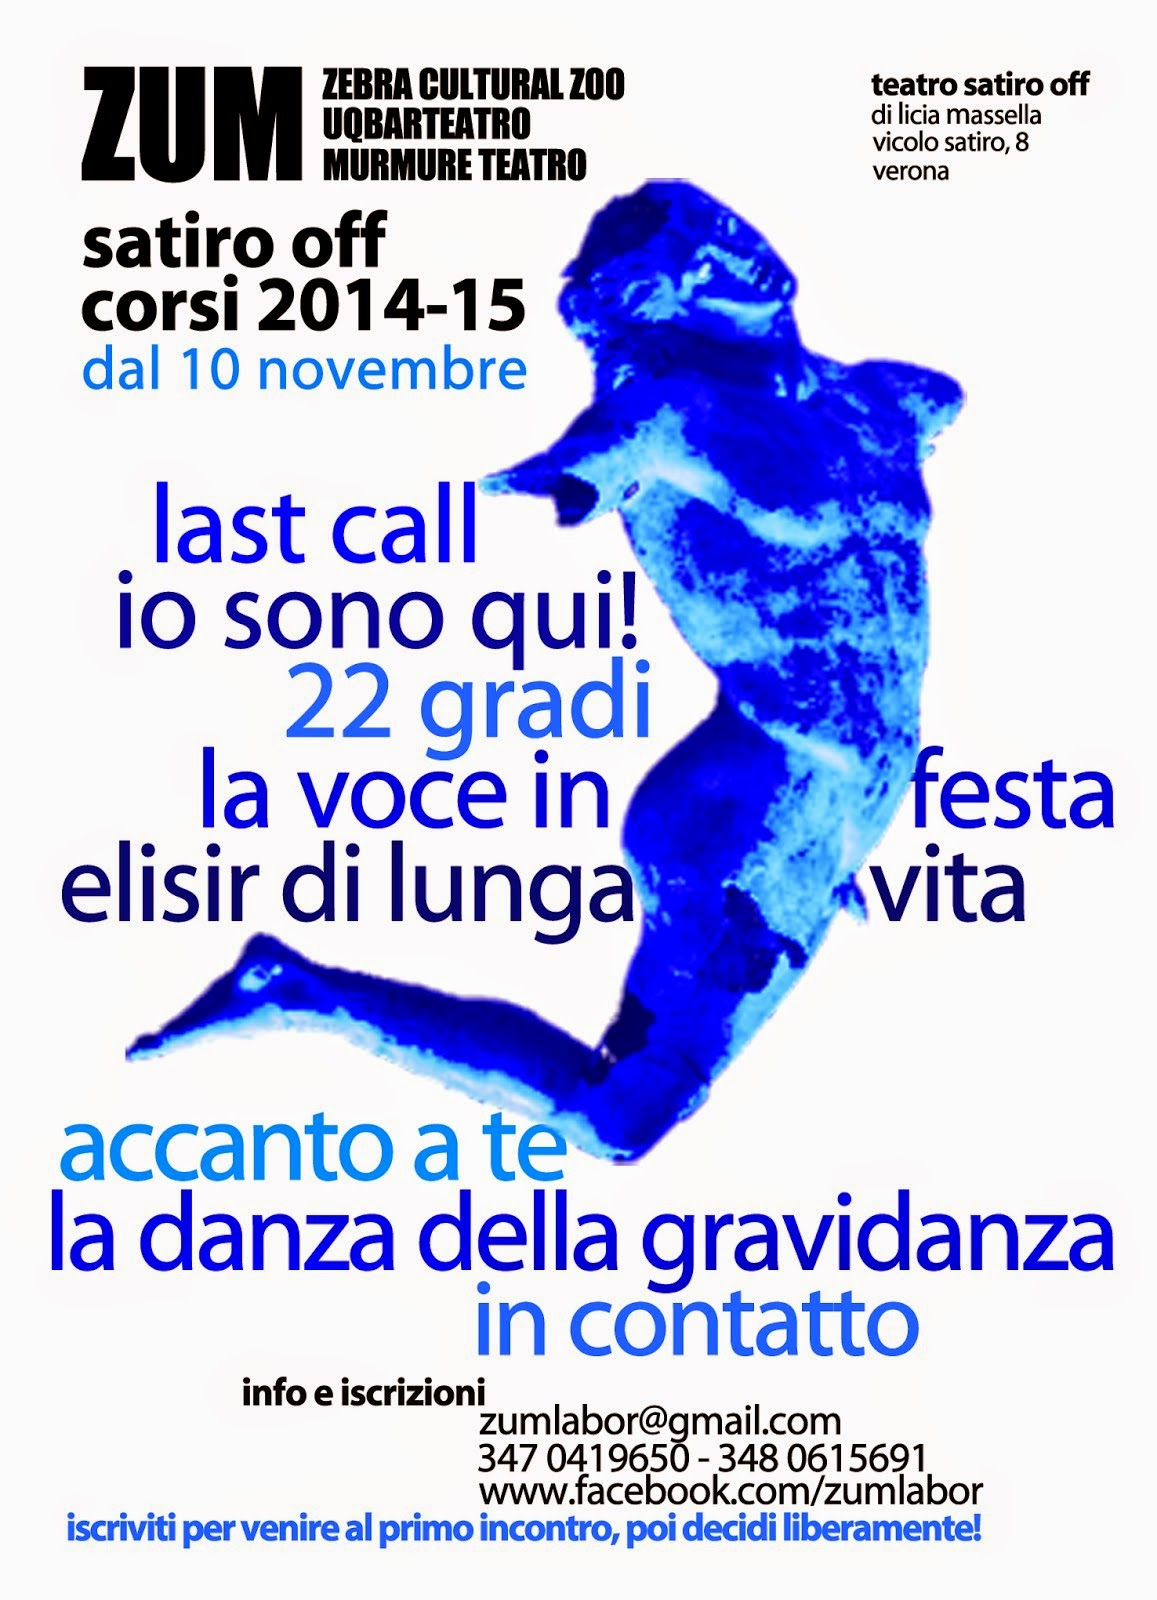 ZUM-Teatro Satiro Off, vicolo Satiro 8 Verona, corsi 2014-2015 Zebra,UqbarTeatro,MurmureTeatro